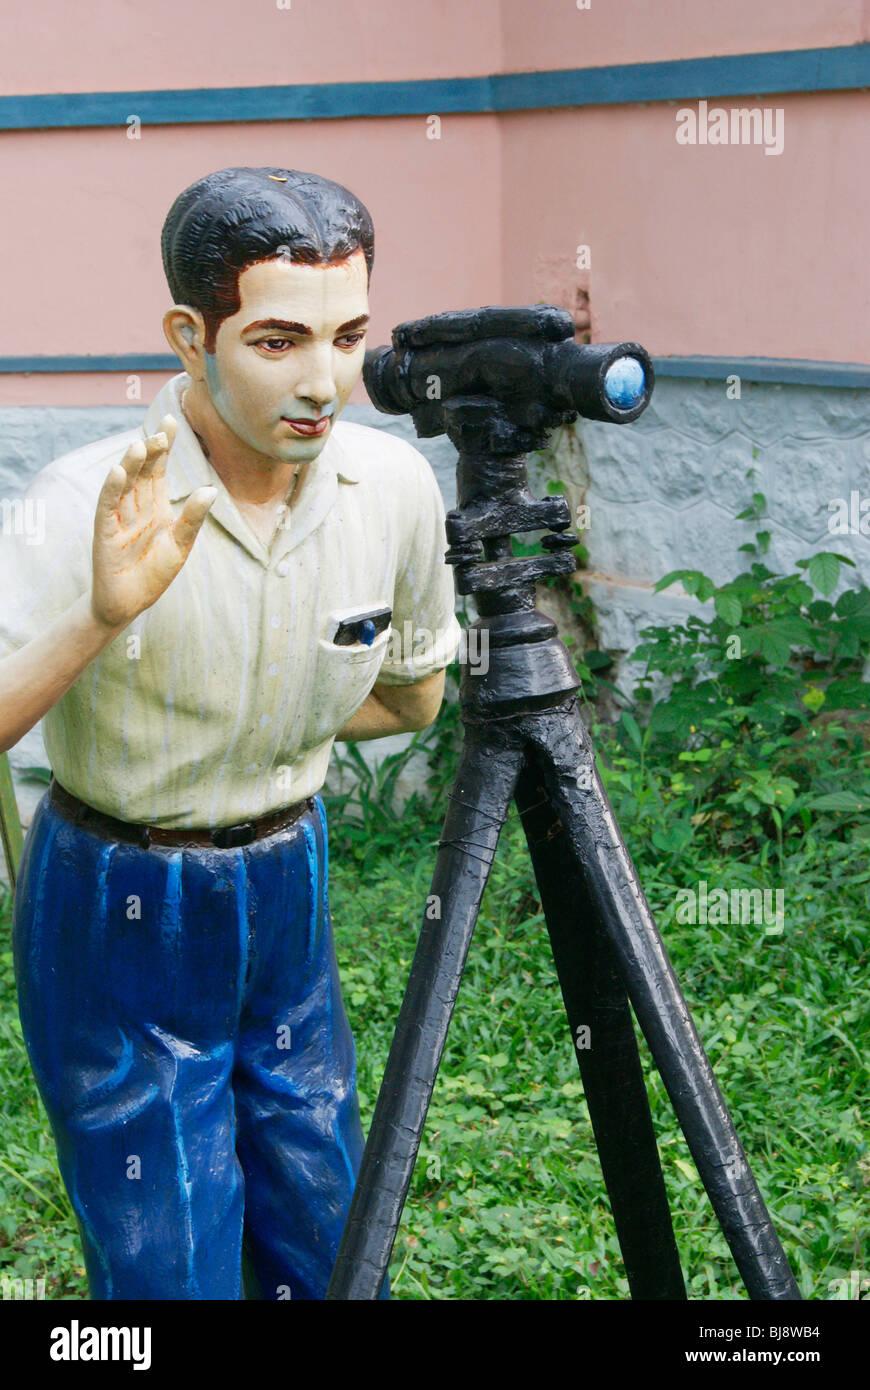 Surveying man sculpture in the beautiful Neyyar Dam garden of Kerala,India.Surveyor Man Statue with Tripod and survey - Stock Image